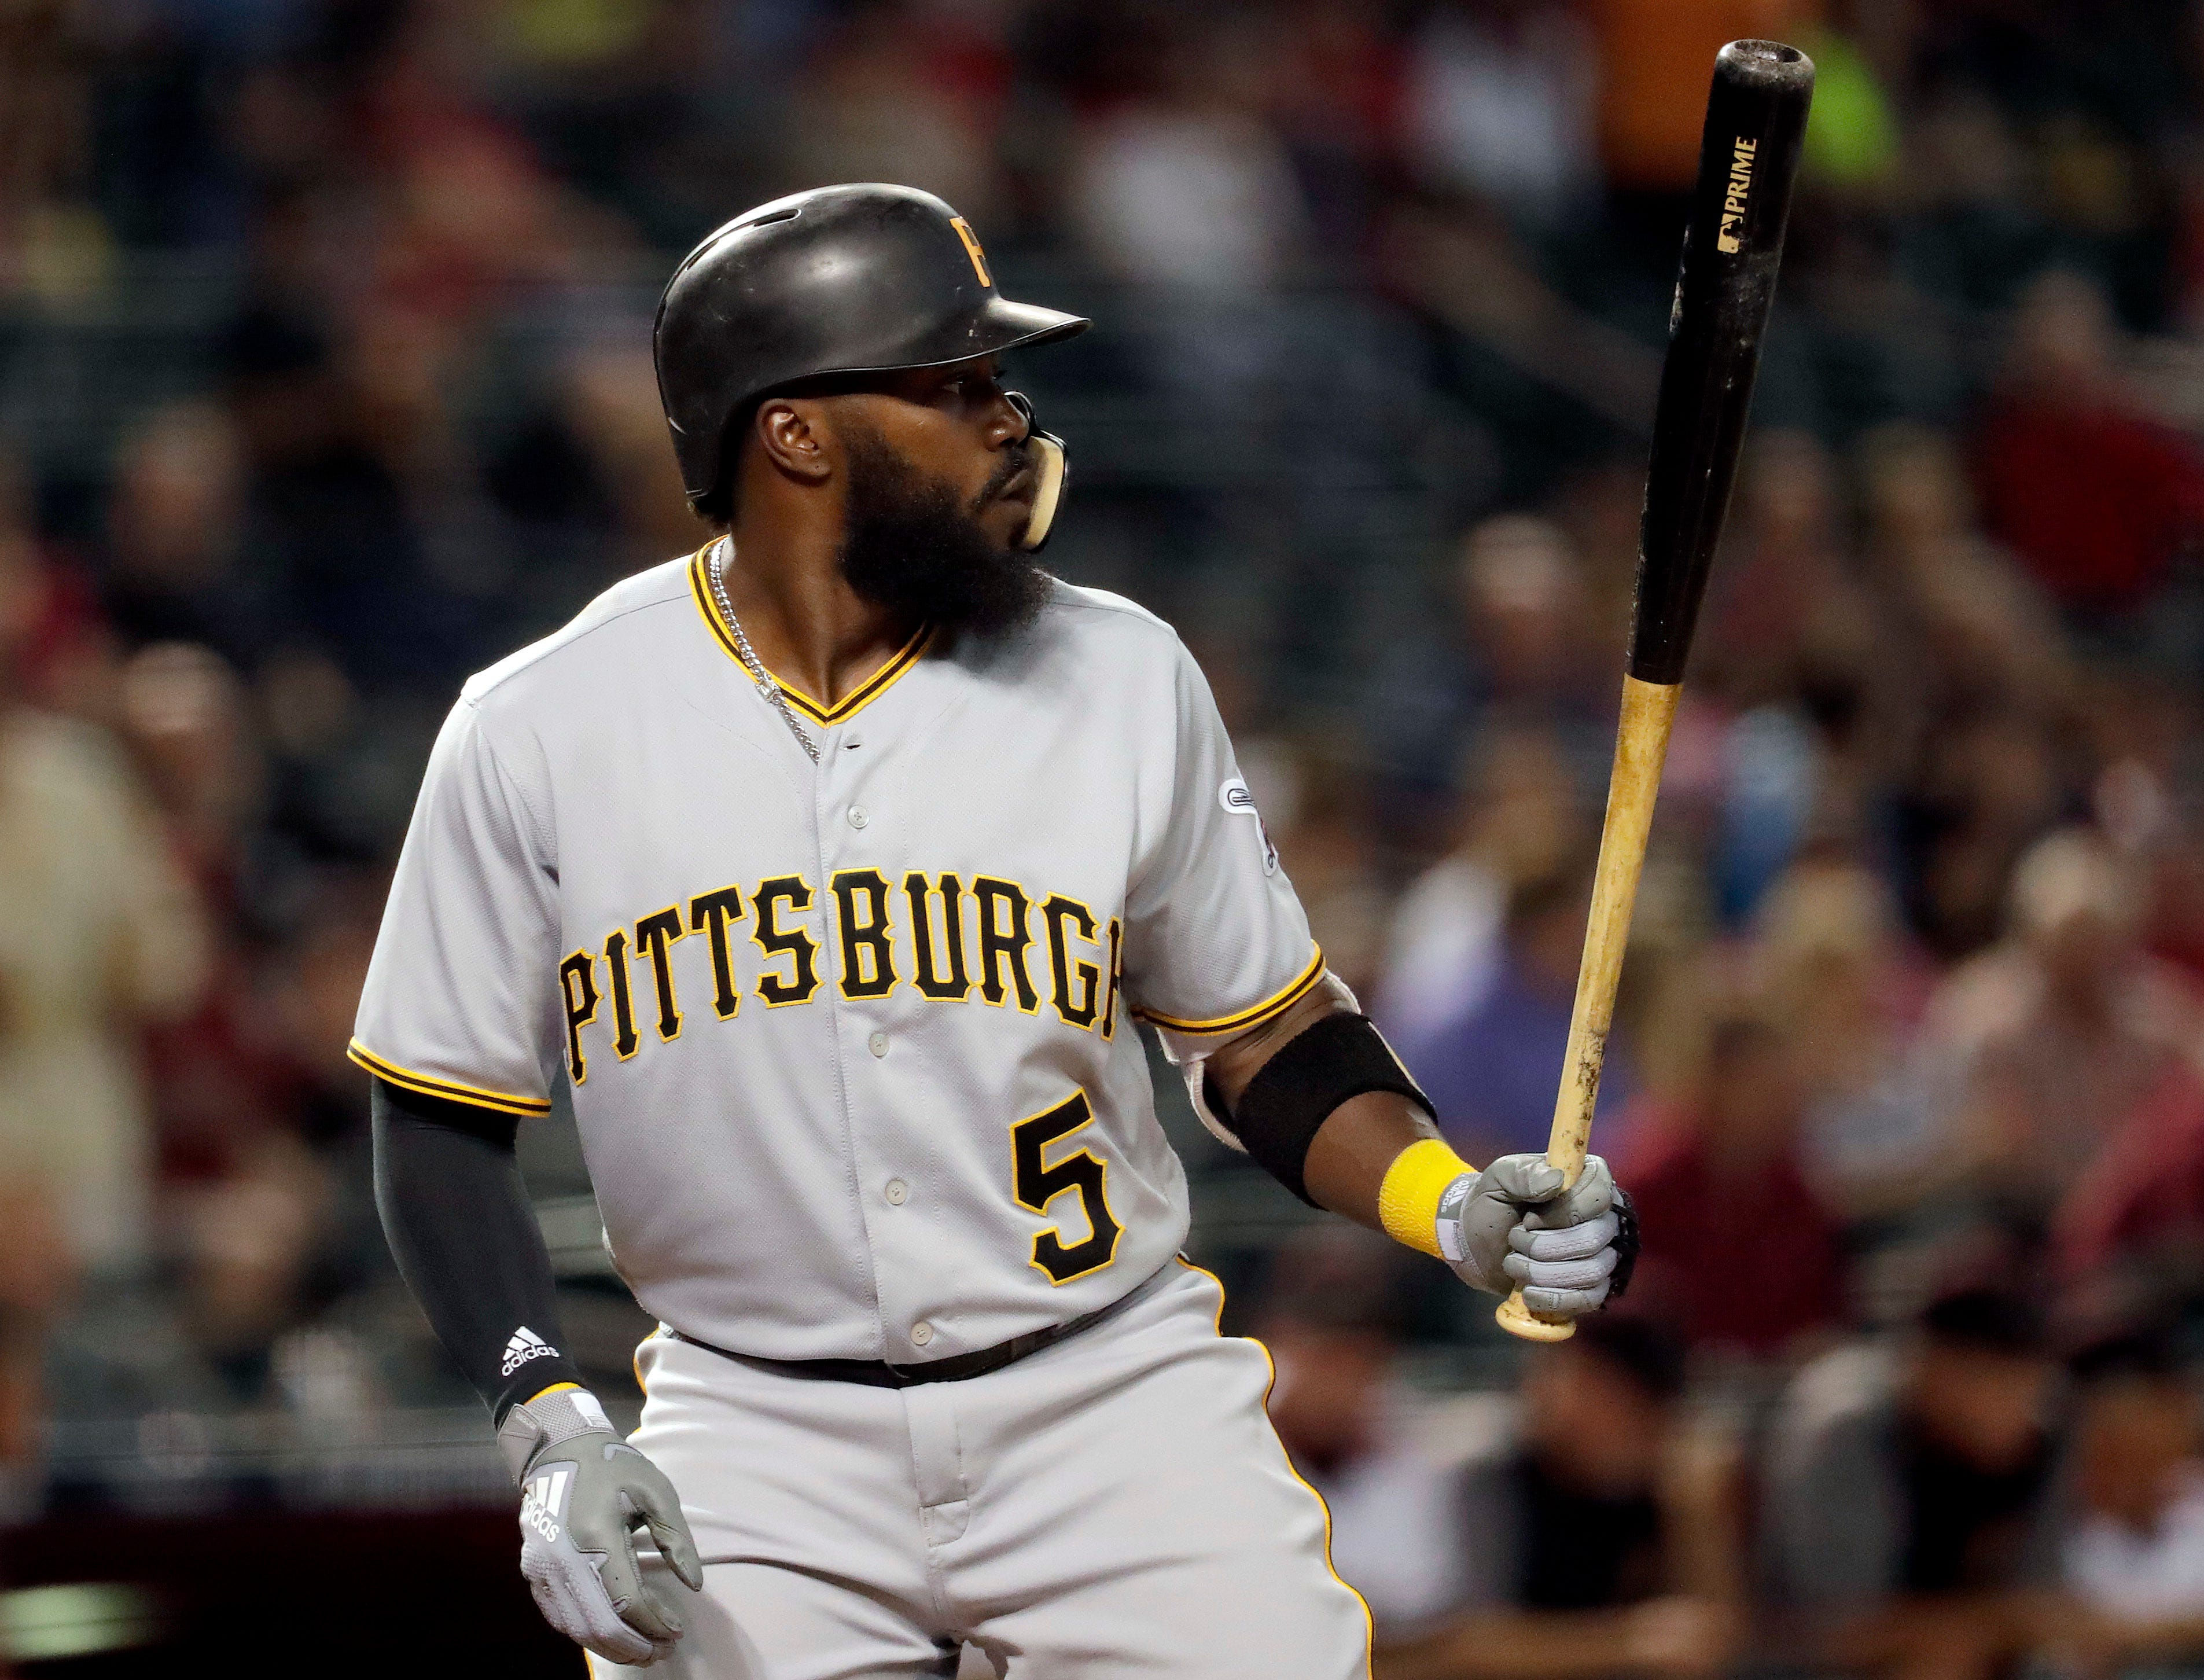 Pittsburgh Pirates' Josh Harrison hits against the Arizona Diamondbacks during the first inning of a baseball game, Monday, June 11, 2018, in Phoenix.